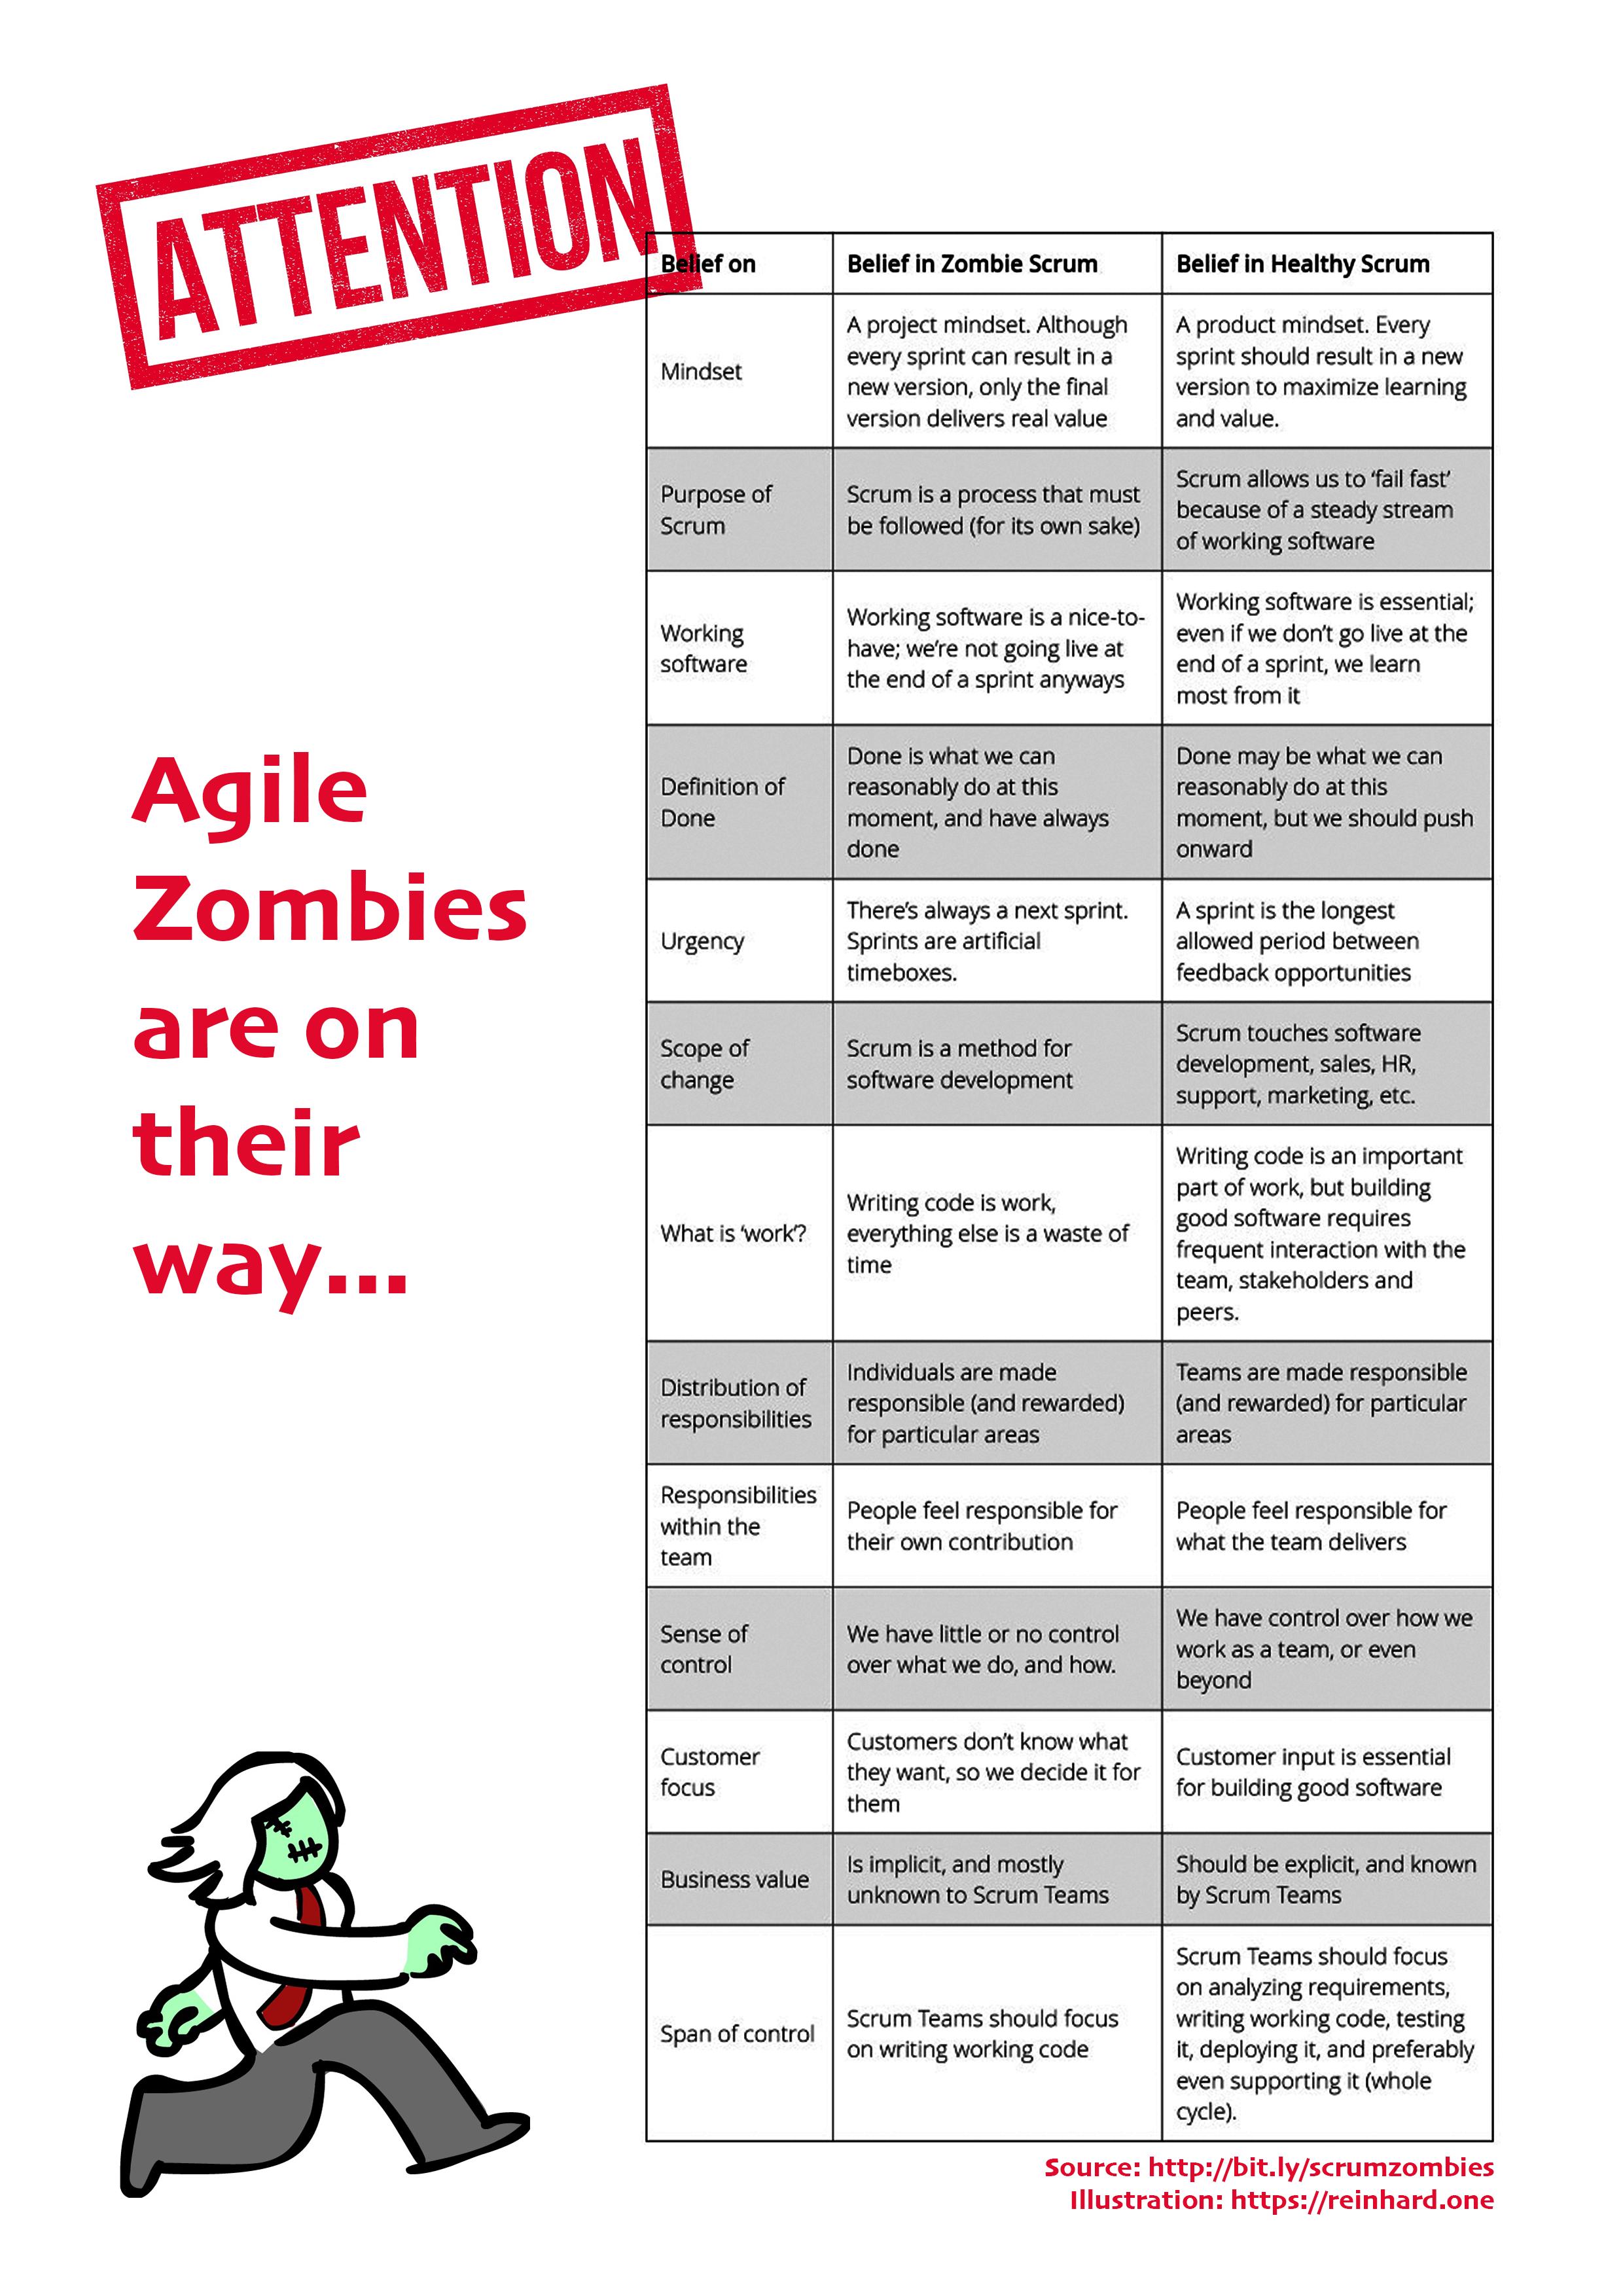 agile-zombies-reinhard-one